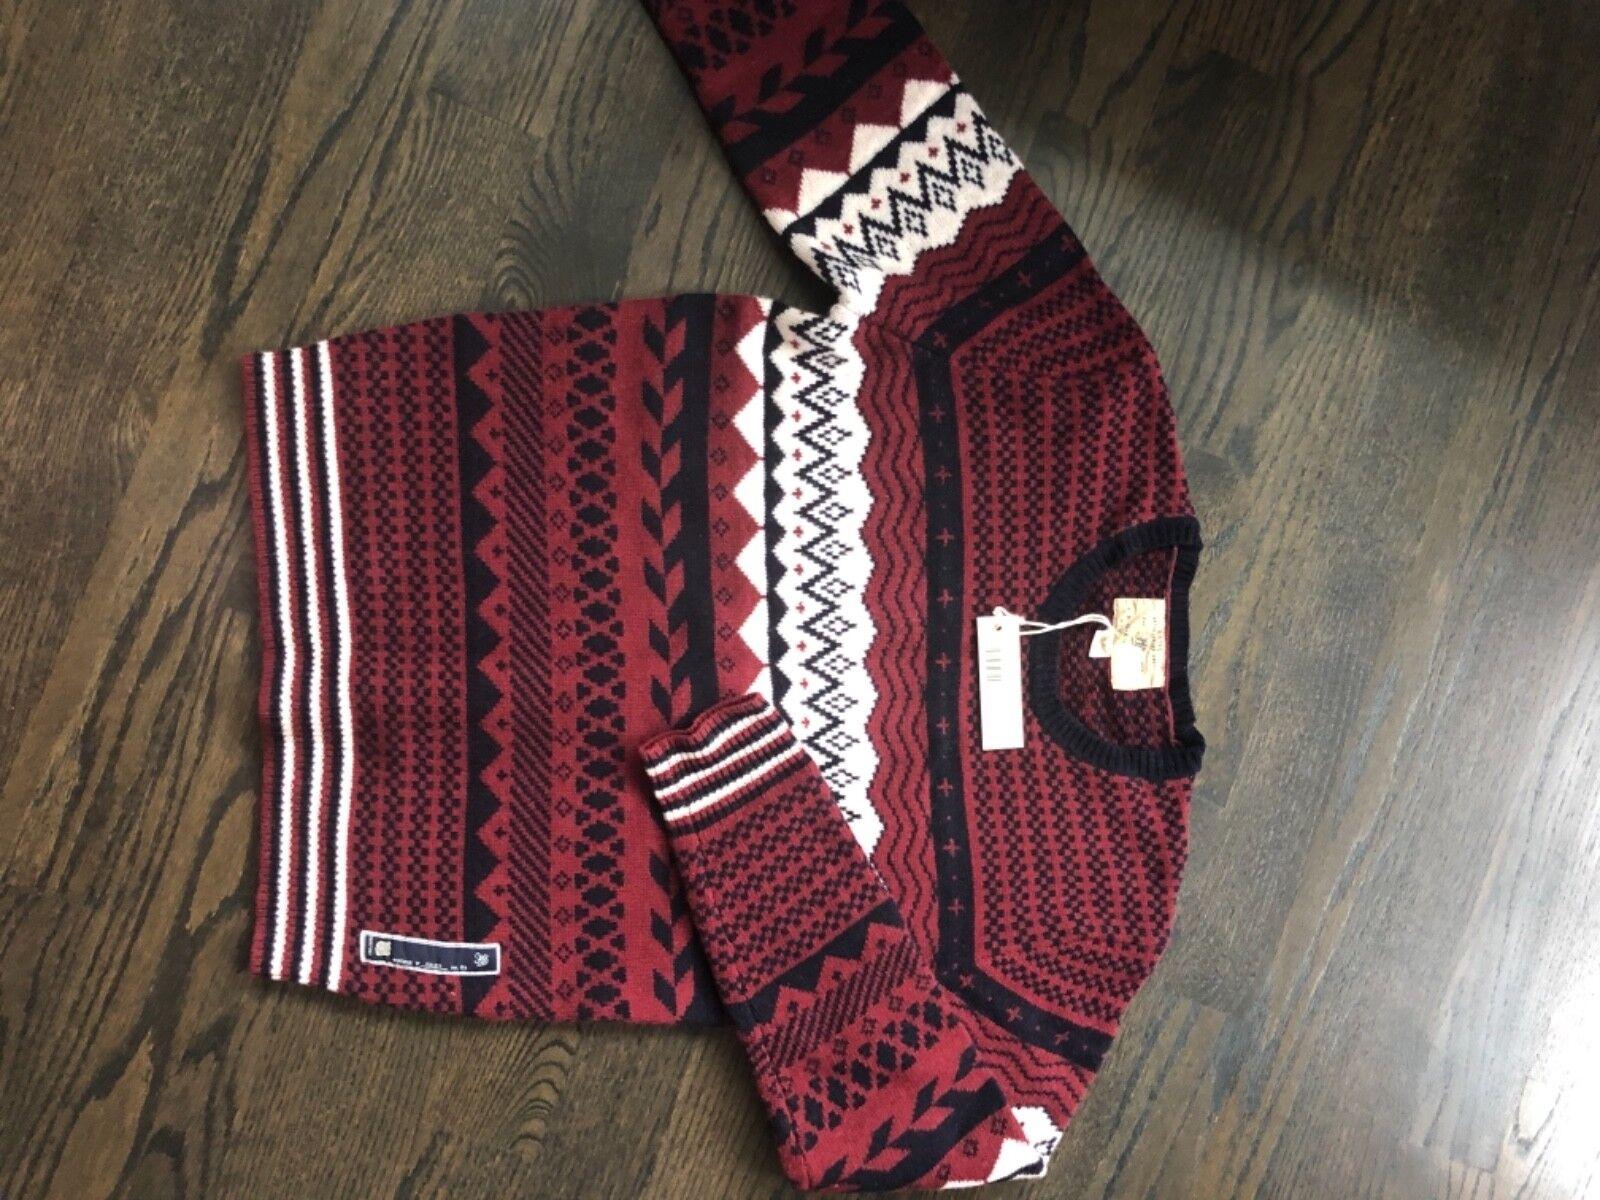 Diesel Apres Ski, Men's Sweater NWT, size L